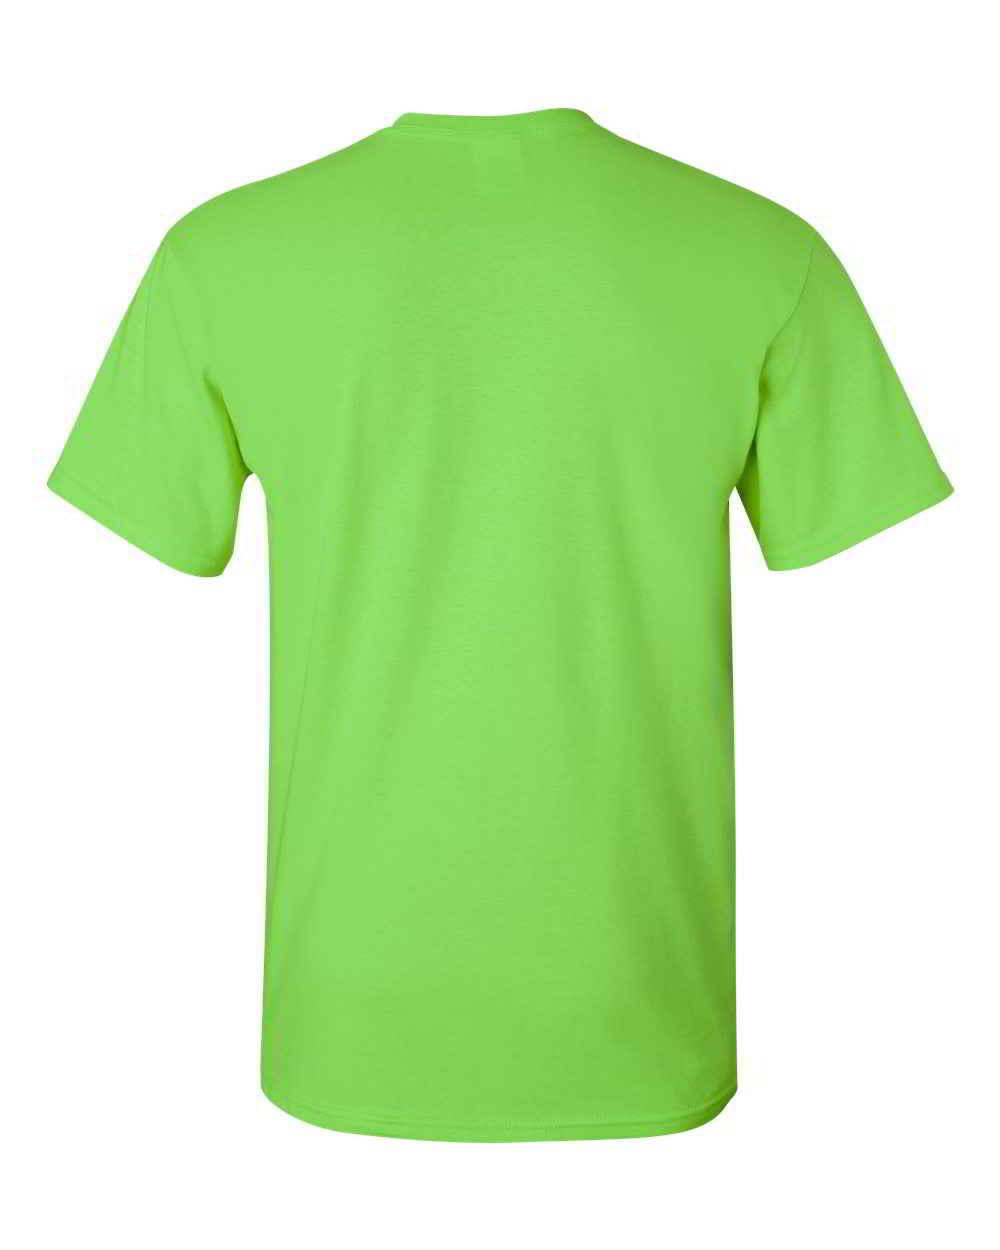 Gildan-Heavy-Cotton-Short-Sleeve-Mens-Green-T-Shirts-5000 thumbnail 20